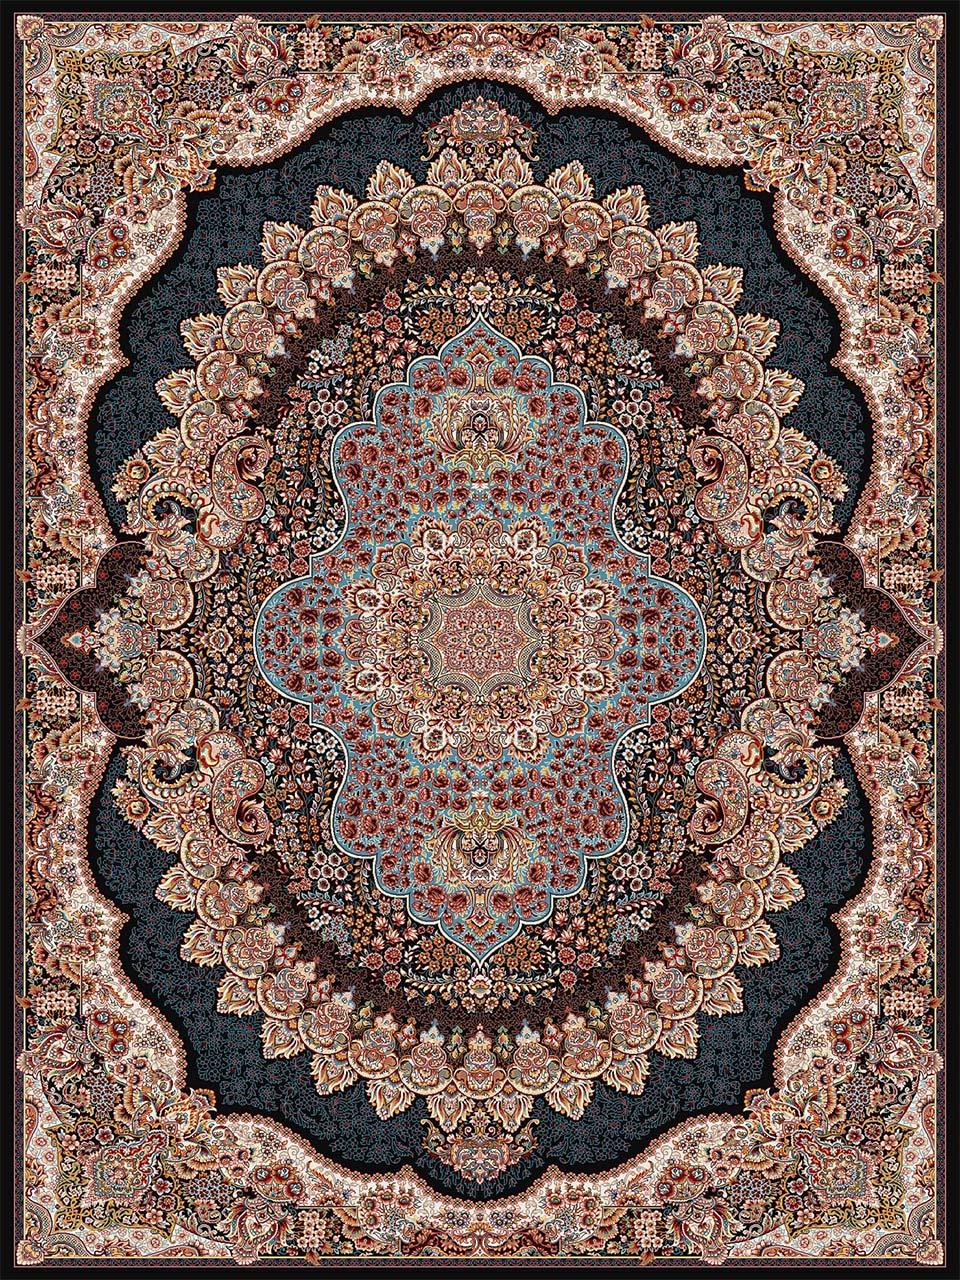 فرش (18130) اکریلیک - 8 رنگ - 500 شانه - سورمه اي - تراکم 1000